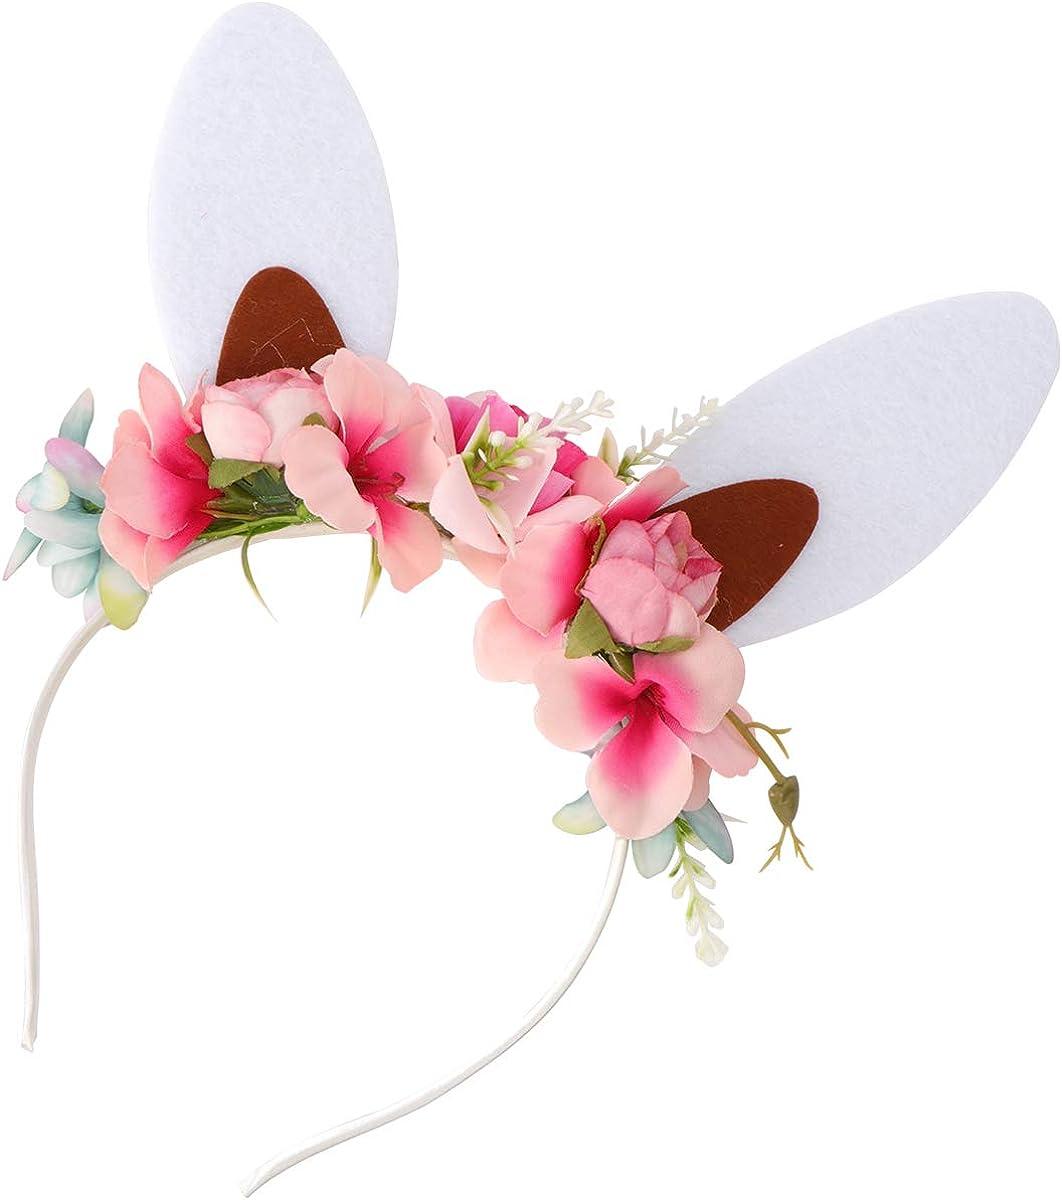 FUNZZY Rabbit Ear Headband Creative Flower Hair Hoop Kids Hairdress Lovely Headwear Photo Props for Women Girls